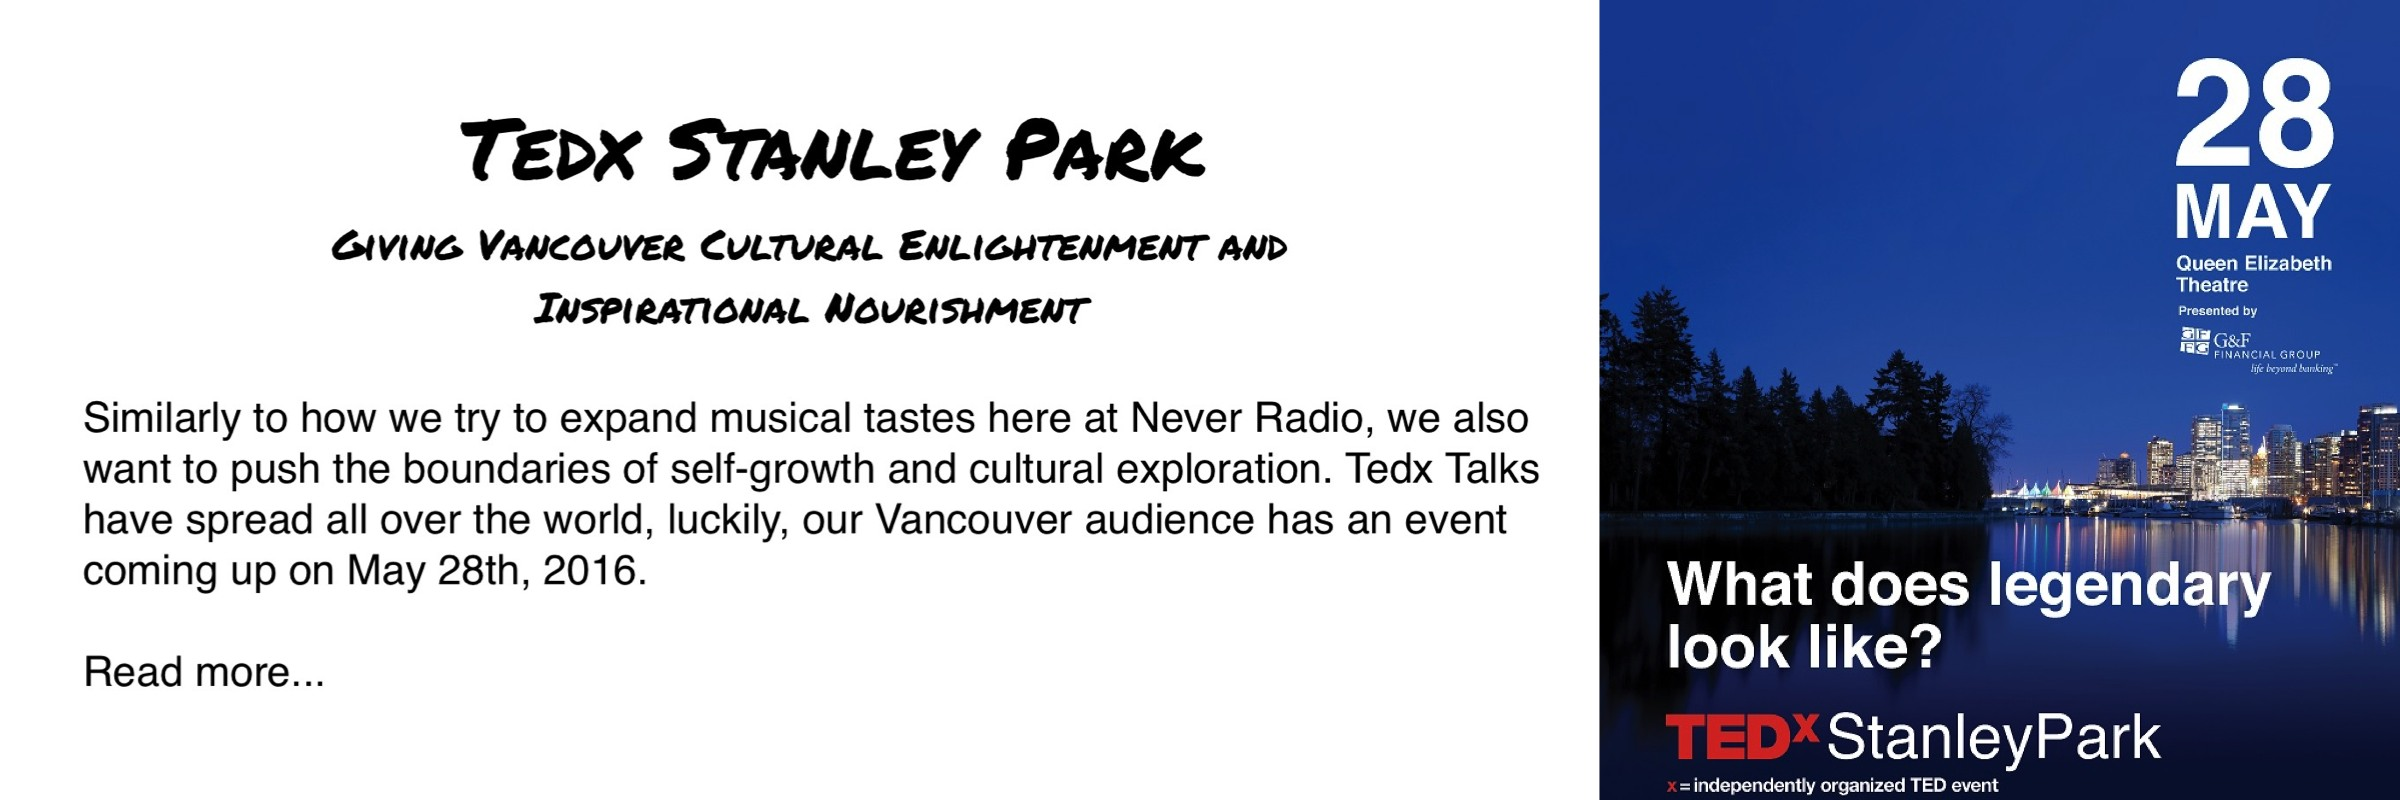 Tedx Stanley Park Vancouver